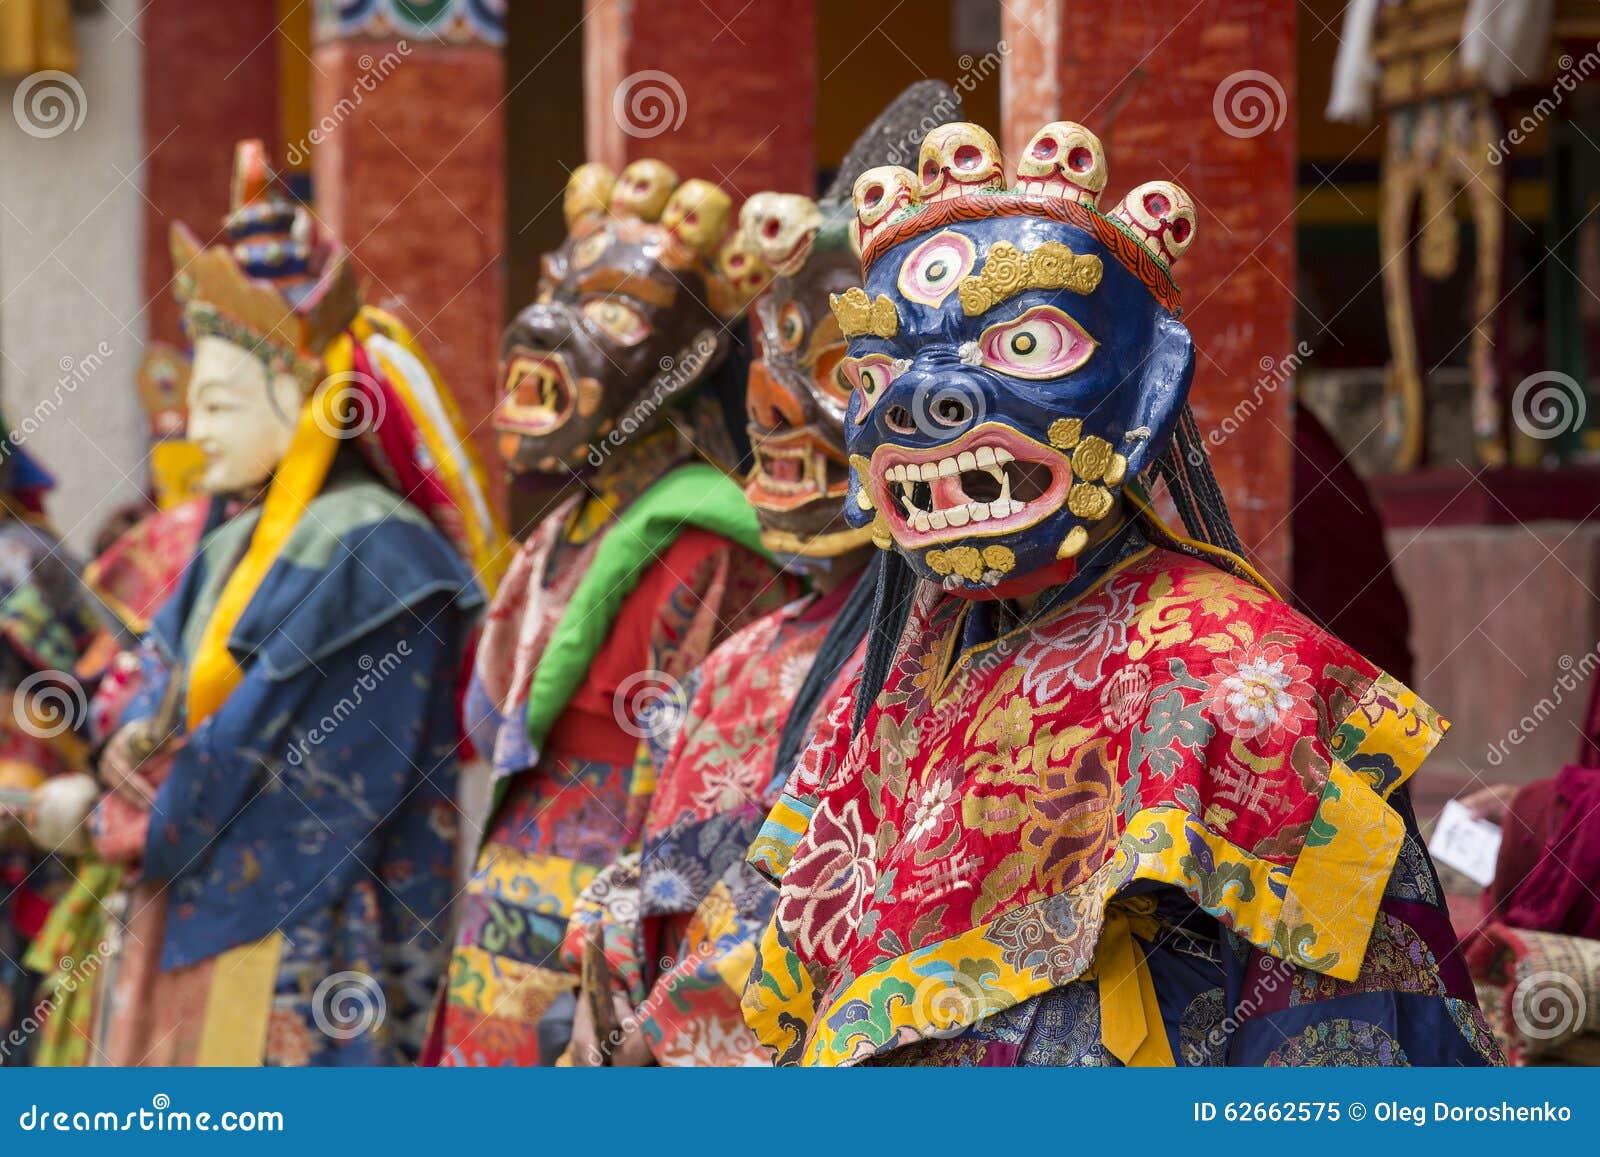 4827fbf9d LAMAYURU, INDIA - JUNE 13, 2015: An unidentified buddhist lamas dressed in  mystical mask dancing Tsam mystery dance in time of Yuru Kabgyat Buddhist  ...